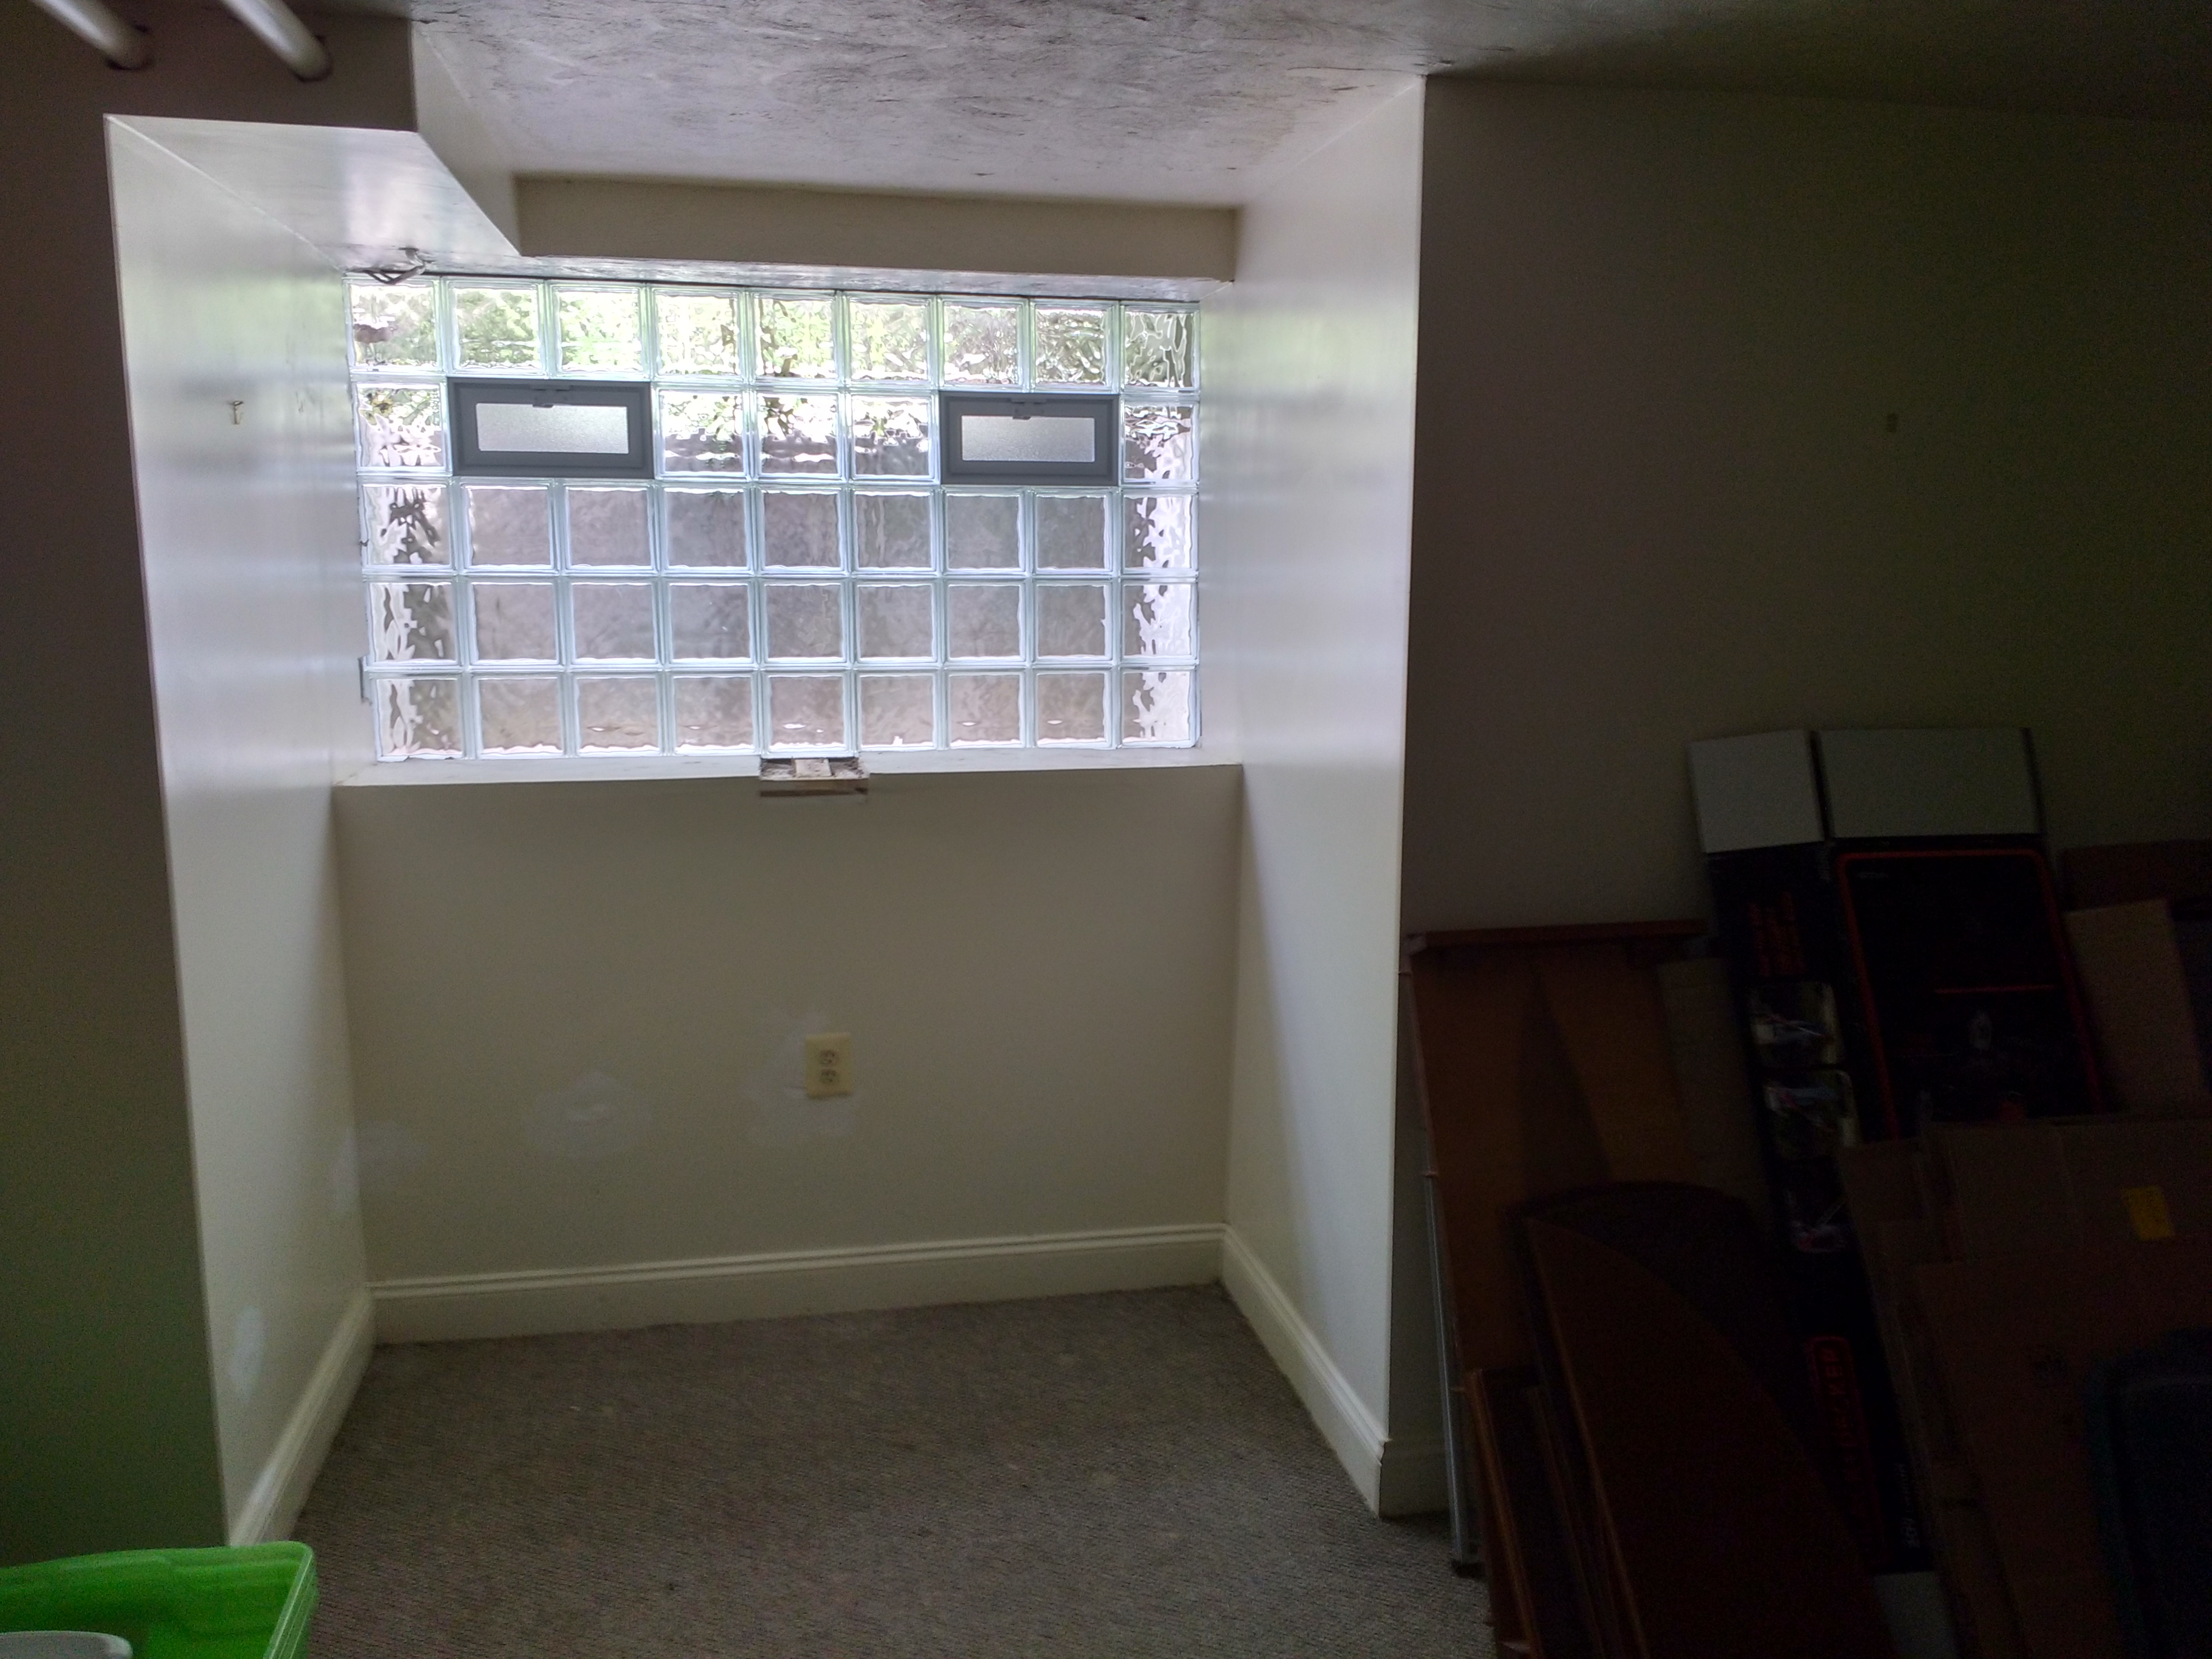 decorative windows for bathrooms pittsburgh corning glass.htm keystone glass block reviews glenside  pa angie s list  keystone glass block reviews glenside